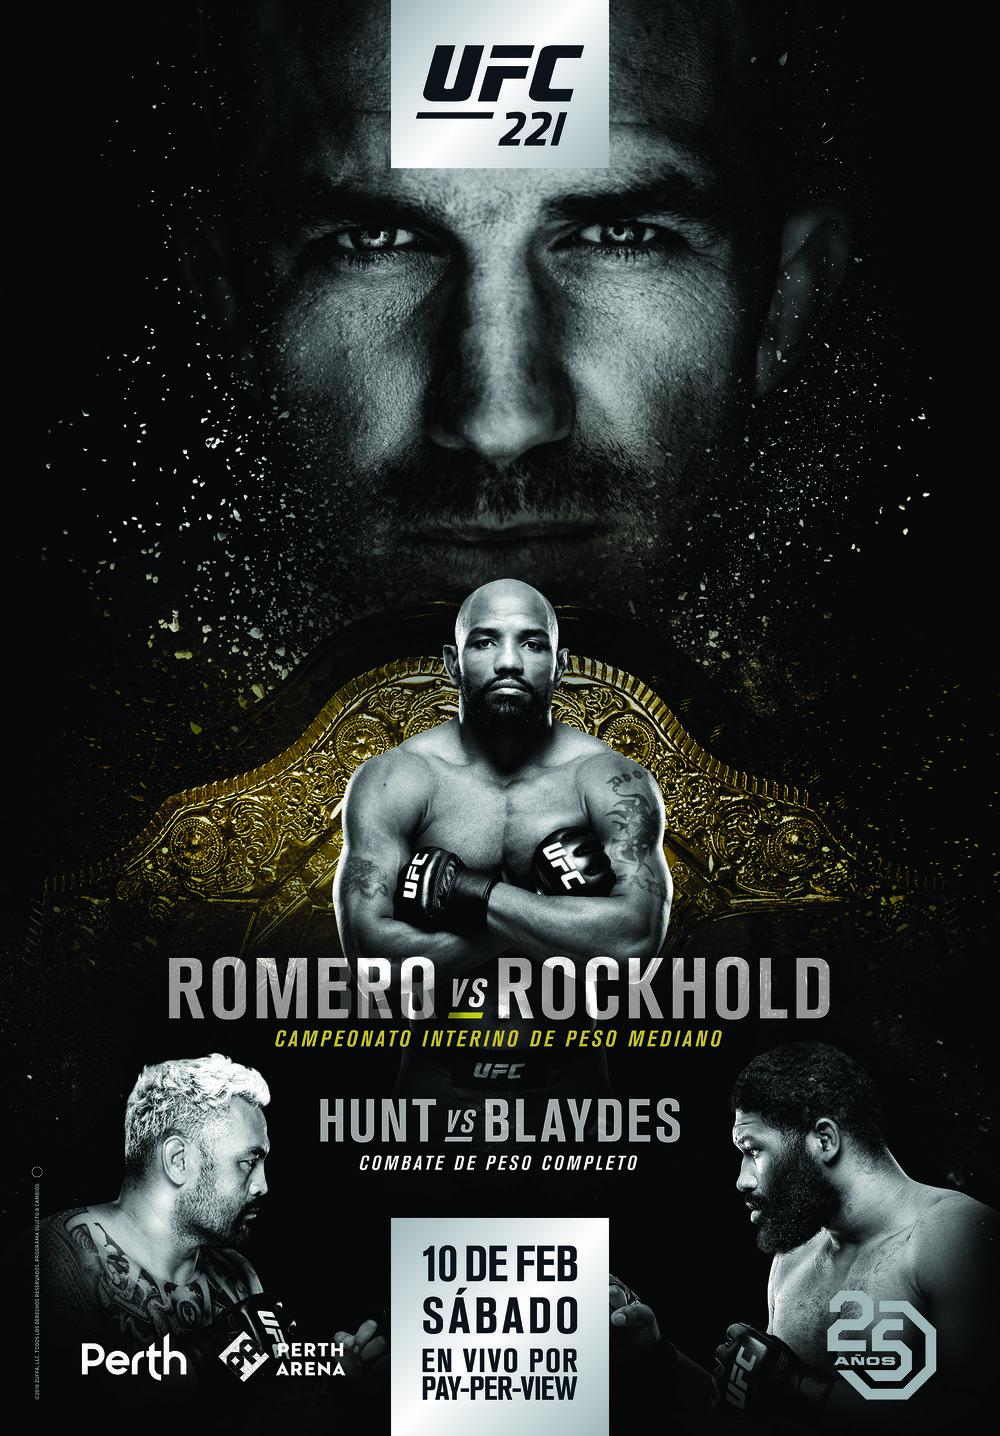 UFC_221_poster_spanish.jpg